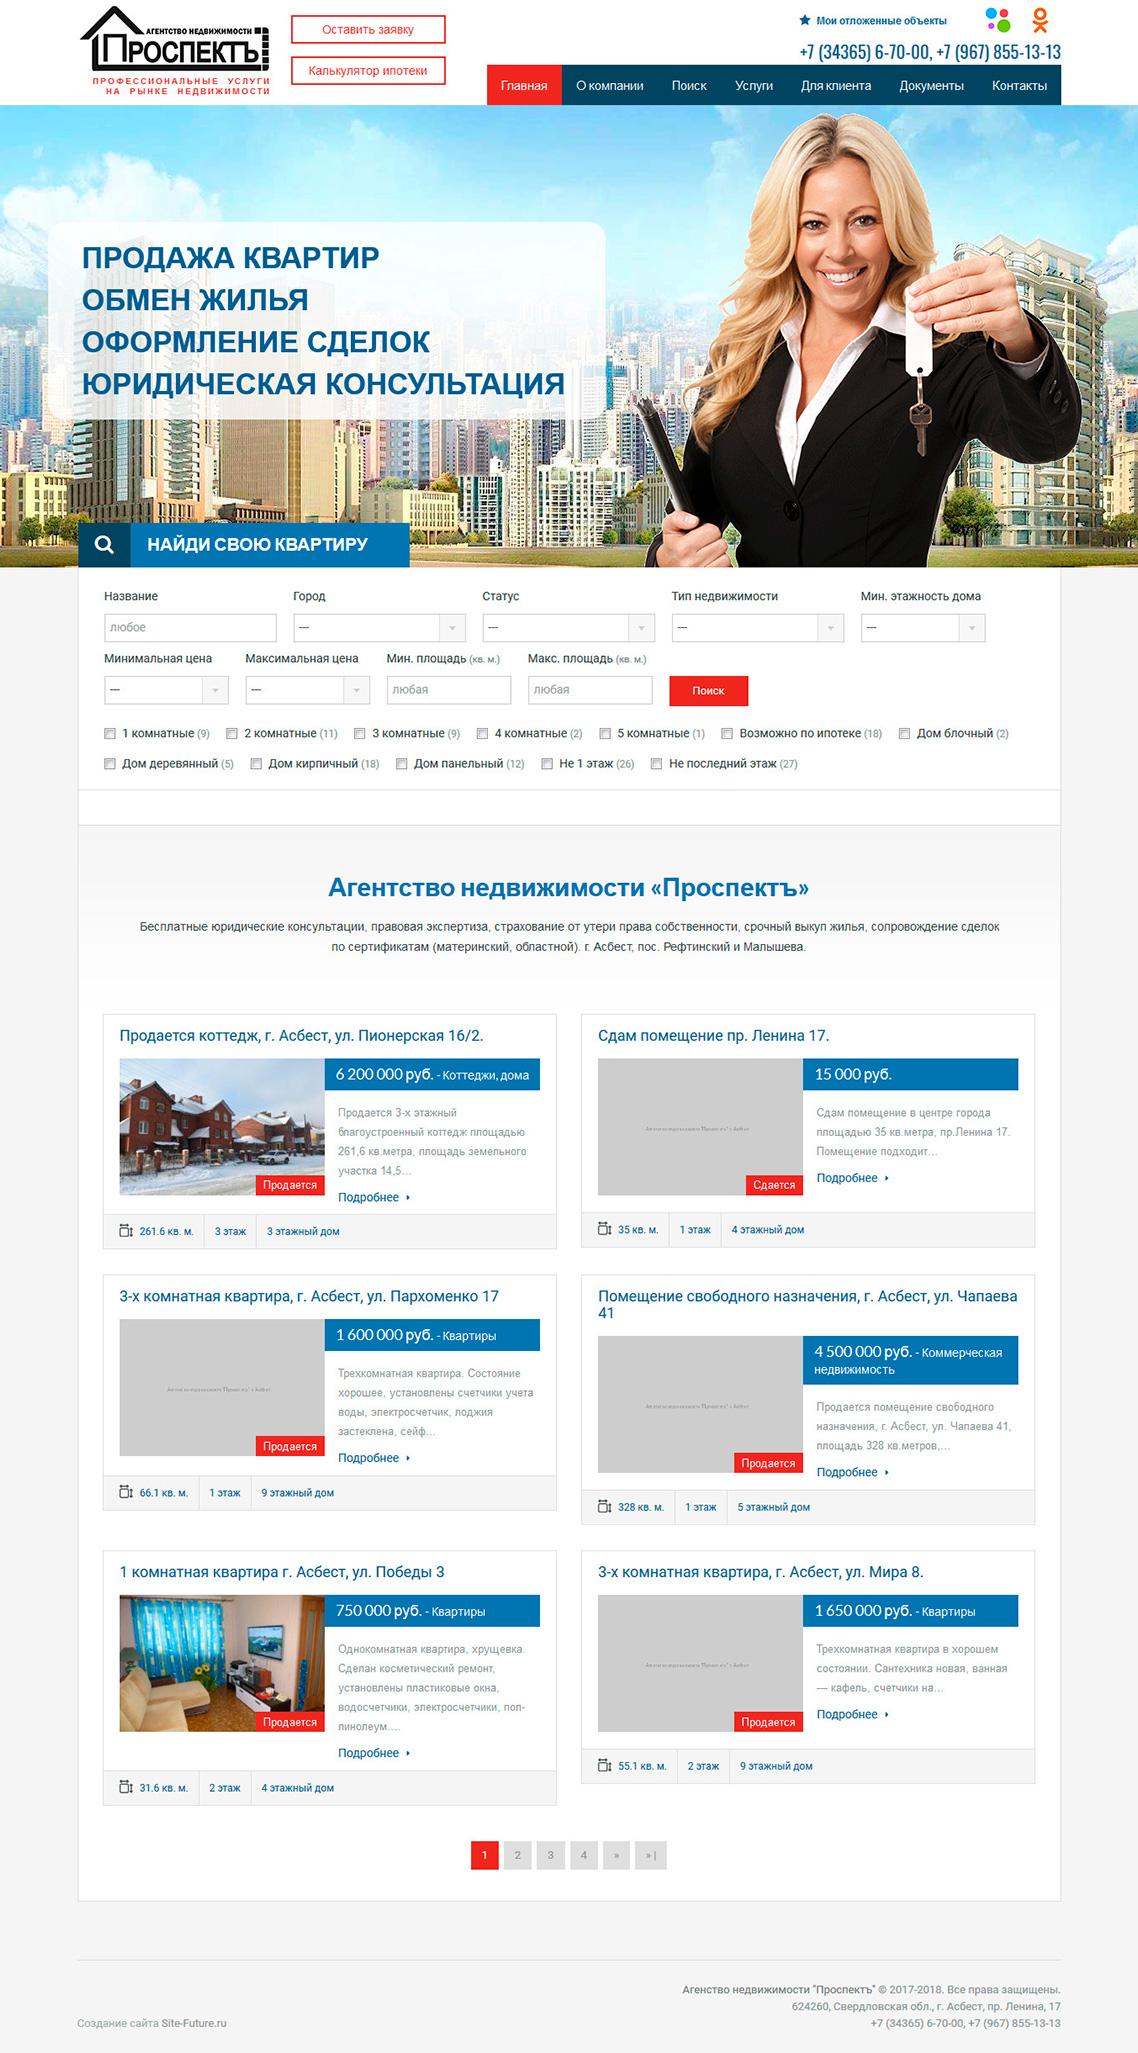 Агенство недвижимости Проспектъ в Асбесте